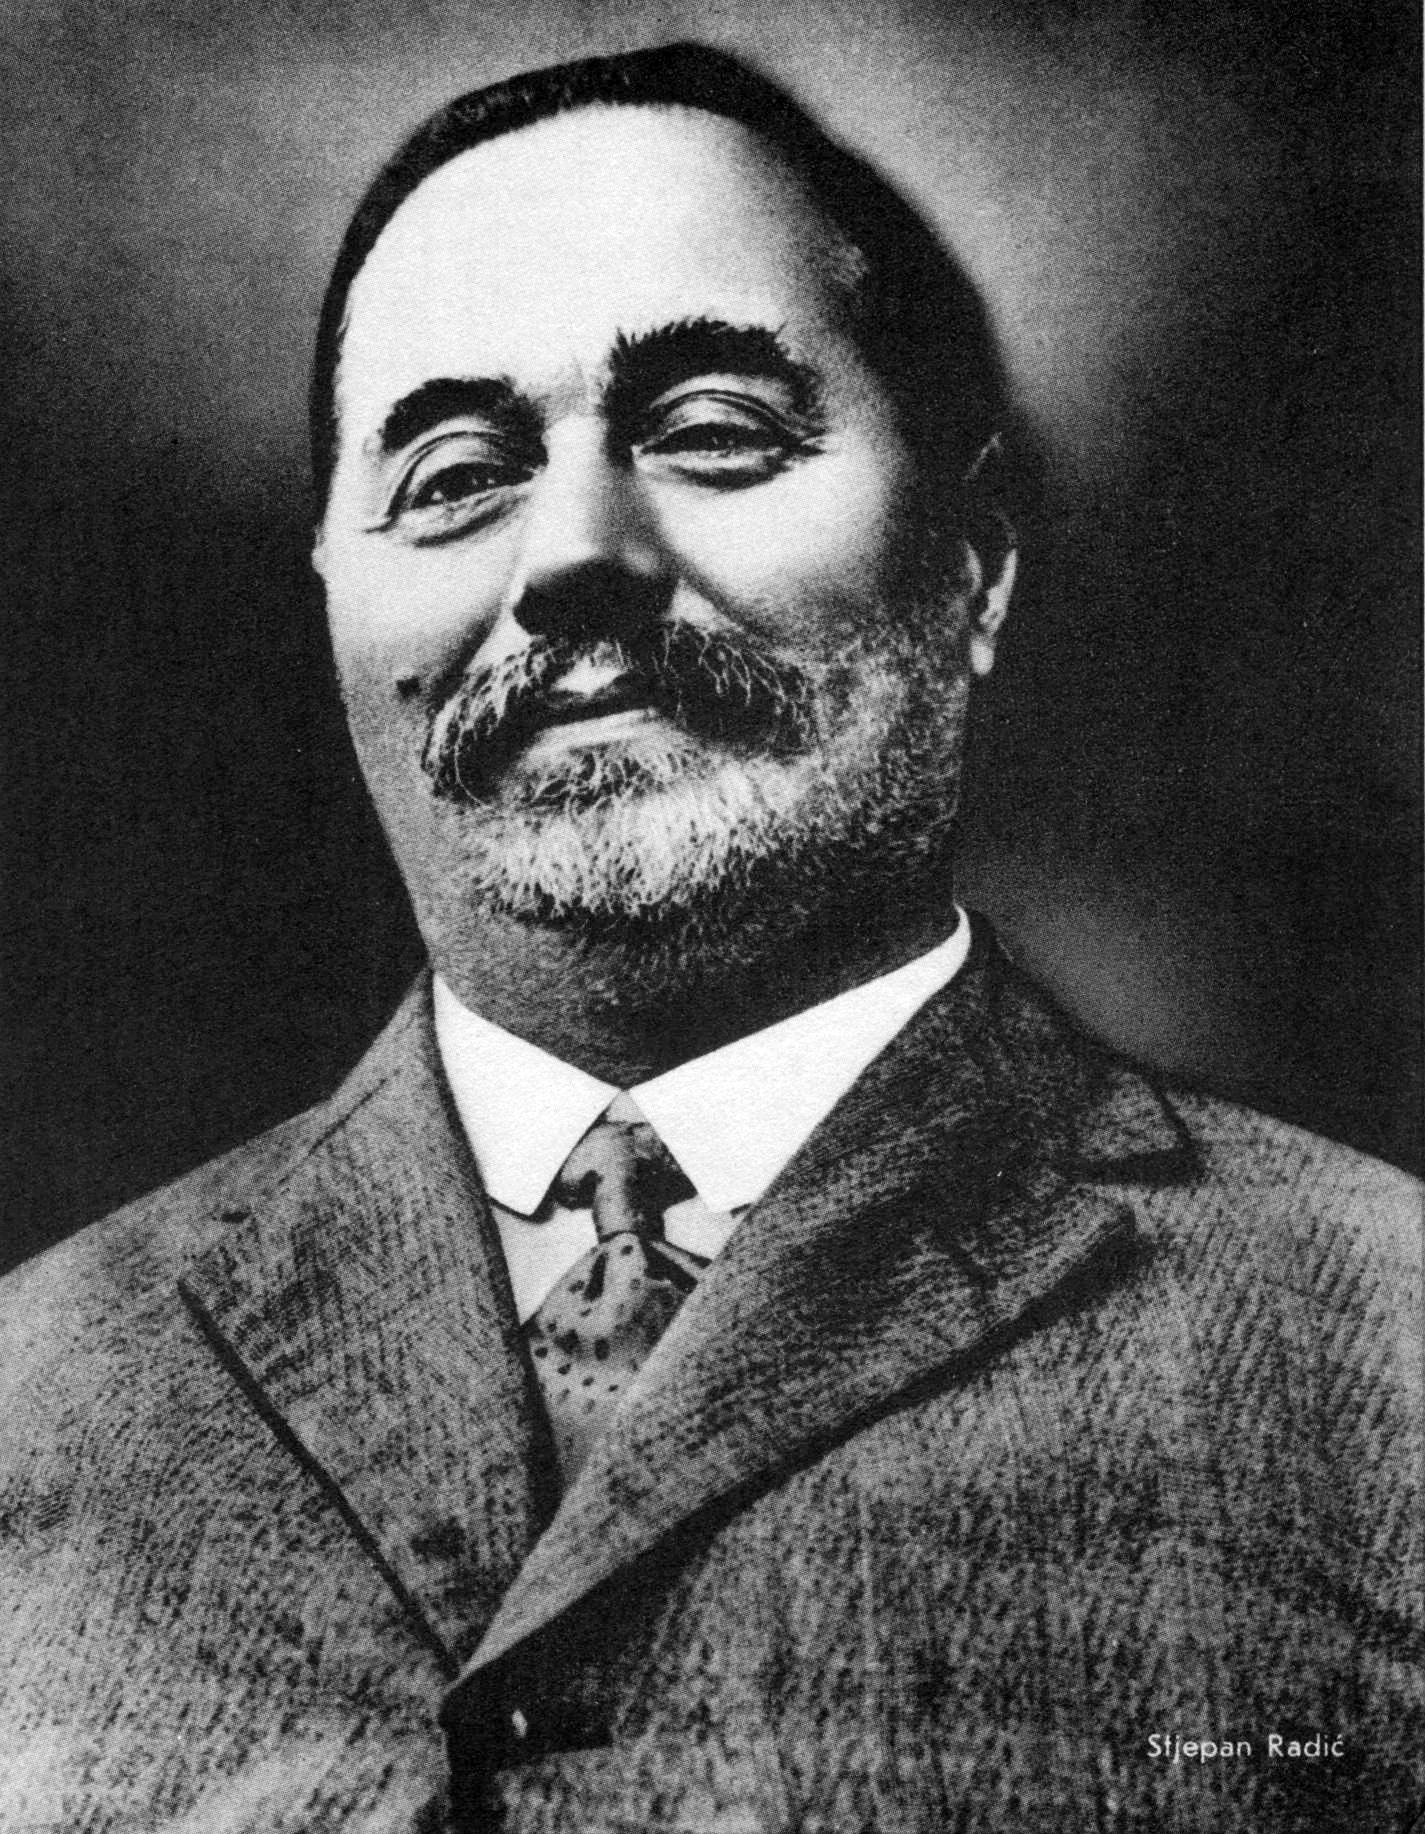 Stjepan Radić in 1920s